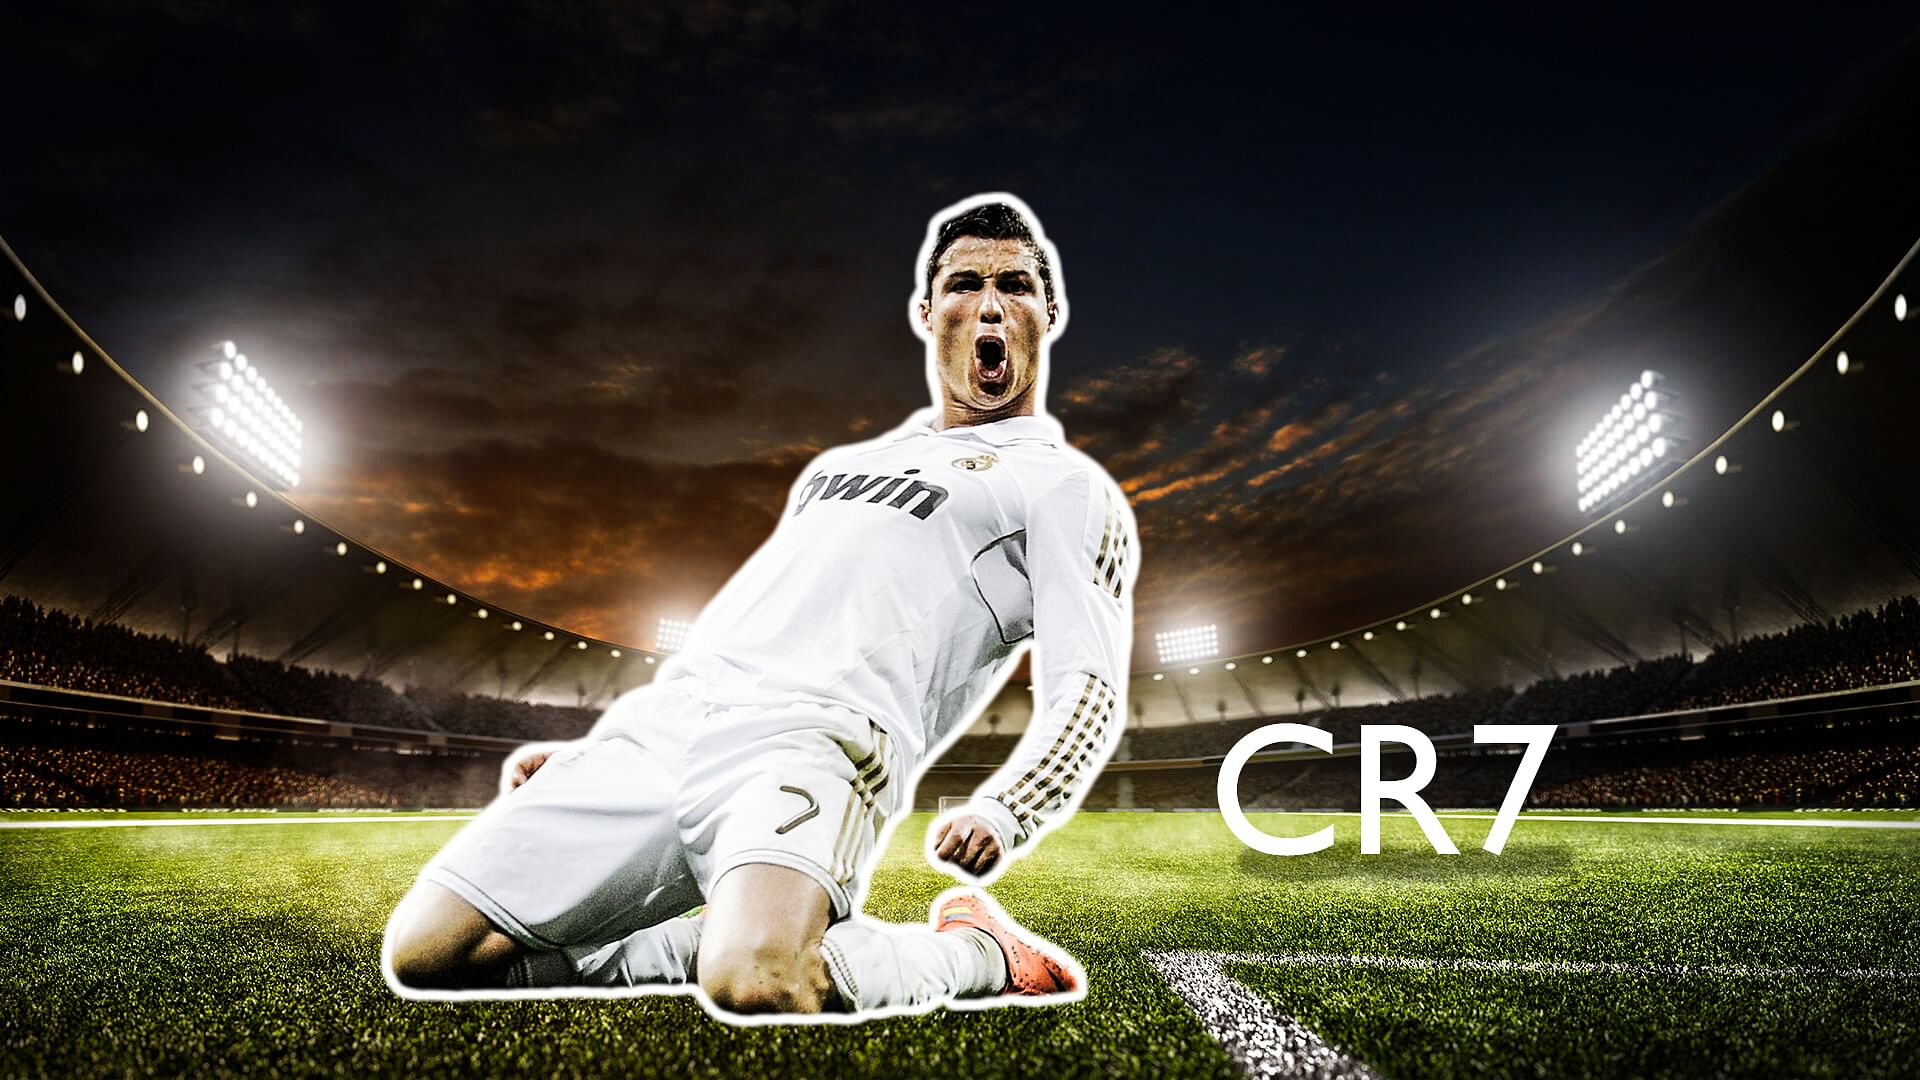 Hd wallpaper ronaldo - Cristiano Ronaldo Wallpaper